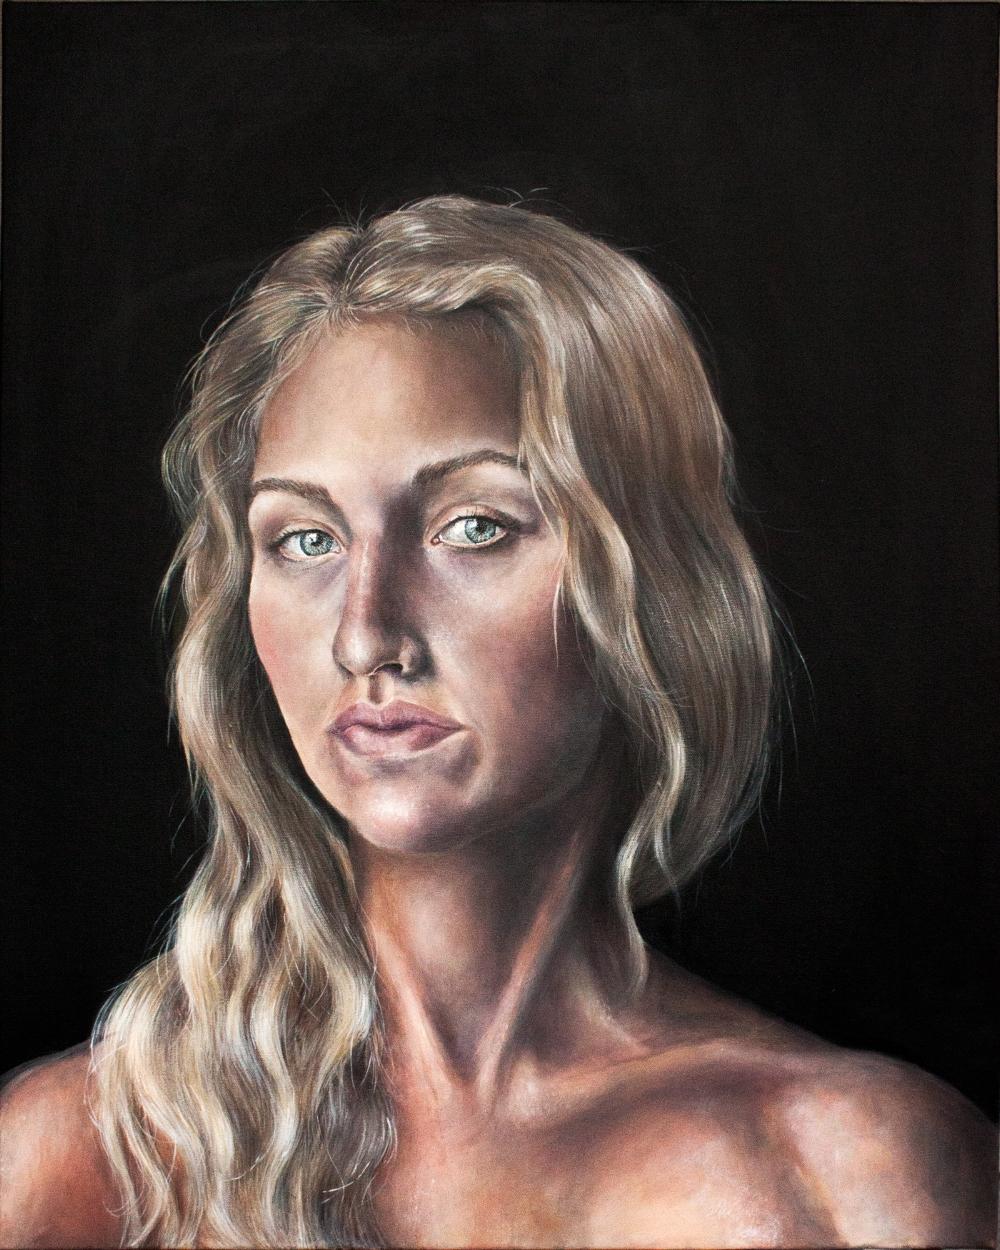 Cathleen - Self portrait